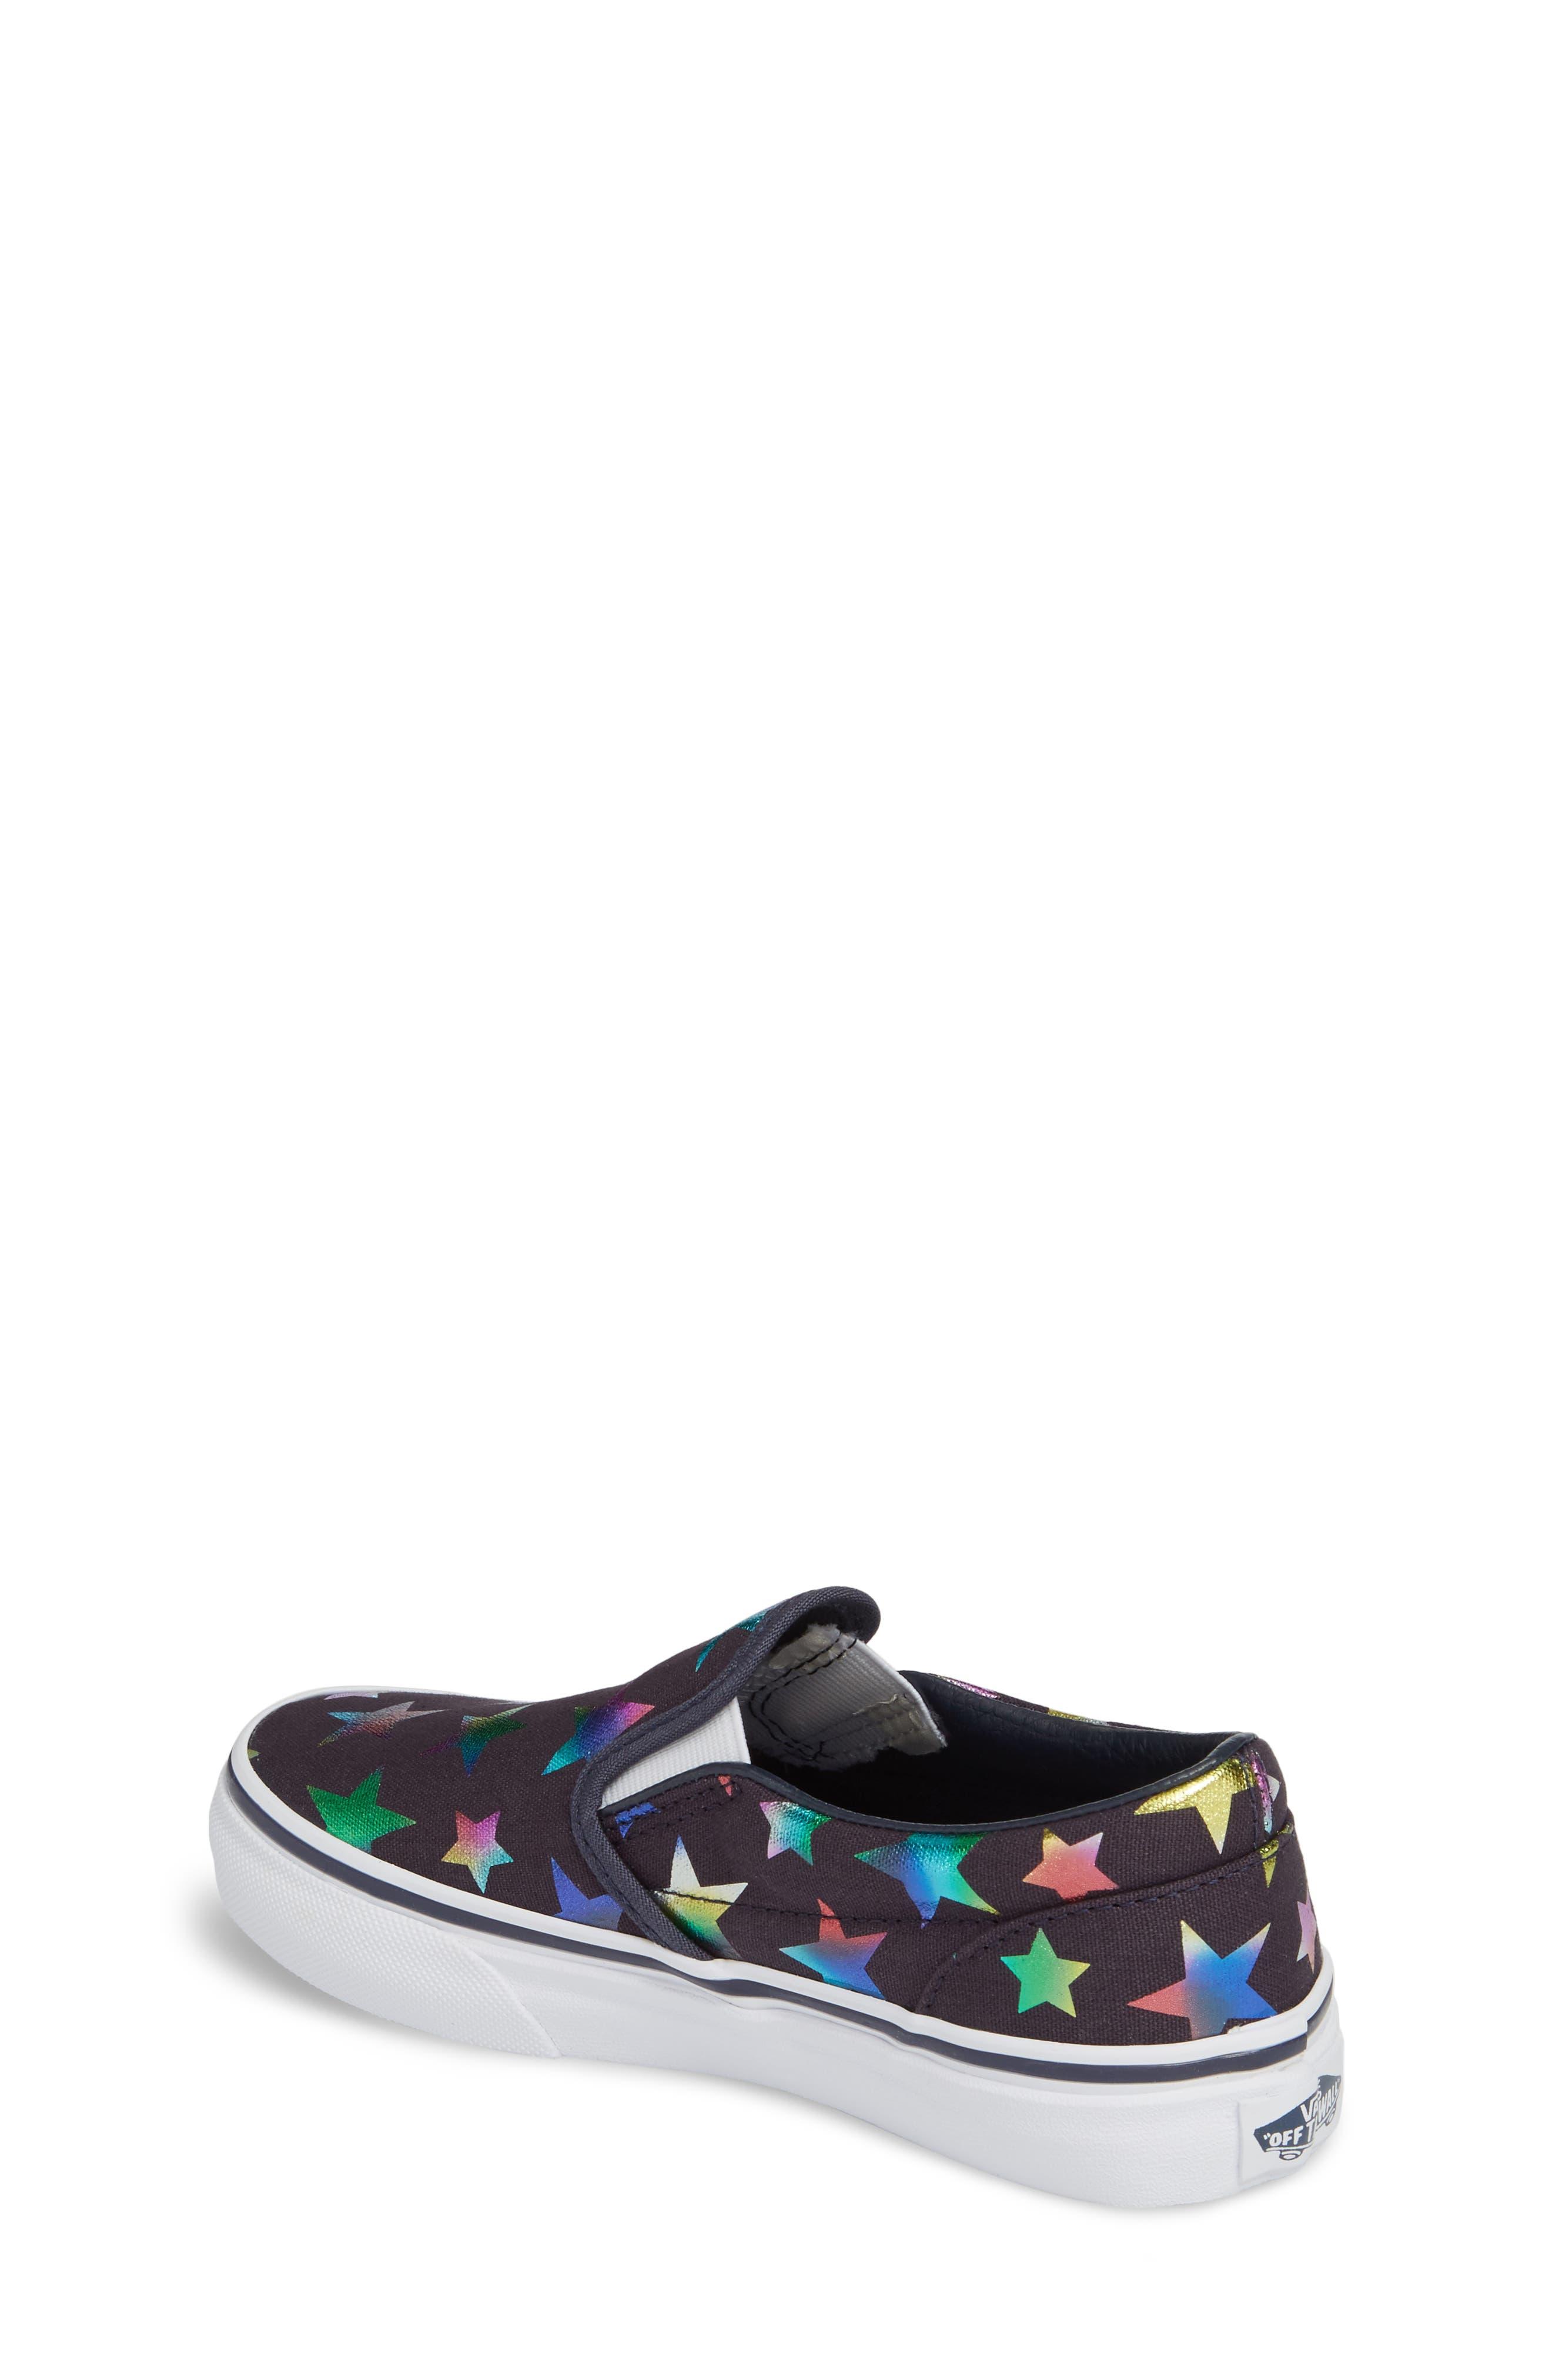 Classic Rainbow Shimmer Star Slip-On Sneaker,                             Alternate thumbnail 2, color,                             Parisian Night Foil Stars